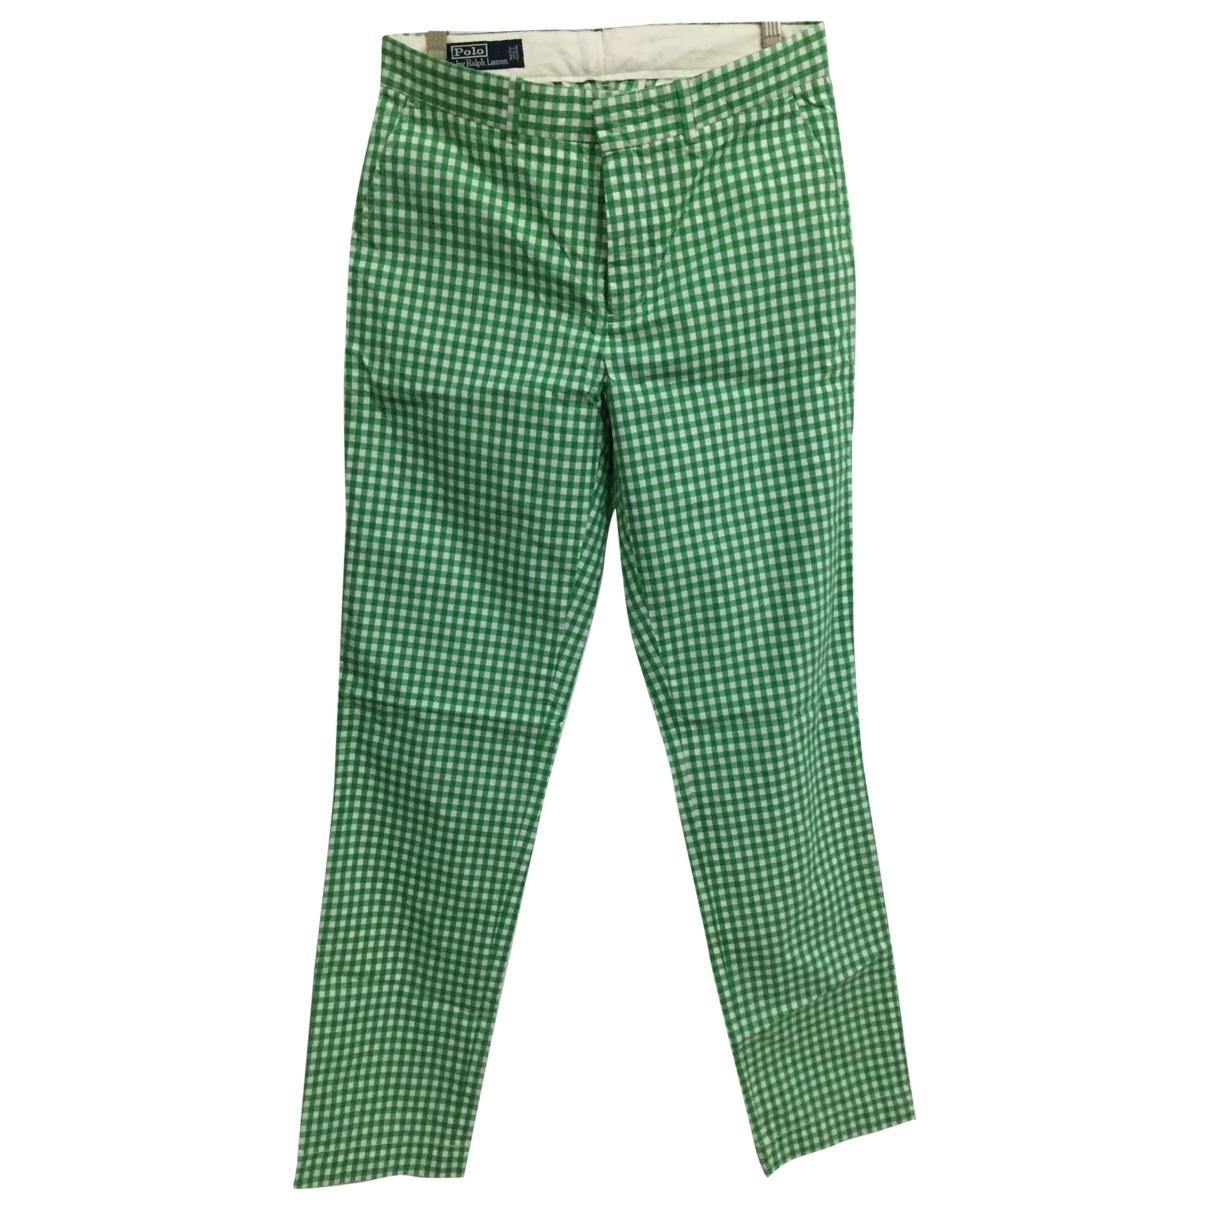 Polo Ralph Lauren \N Green Cotton Trousers for Men 32 UK - US